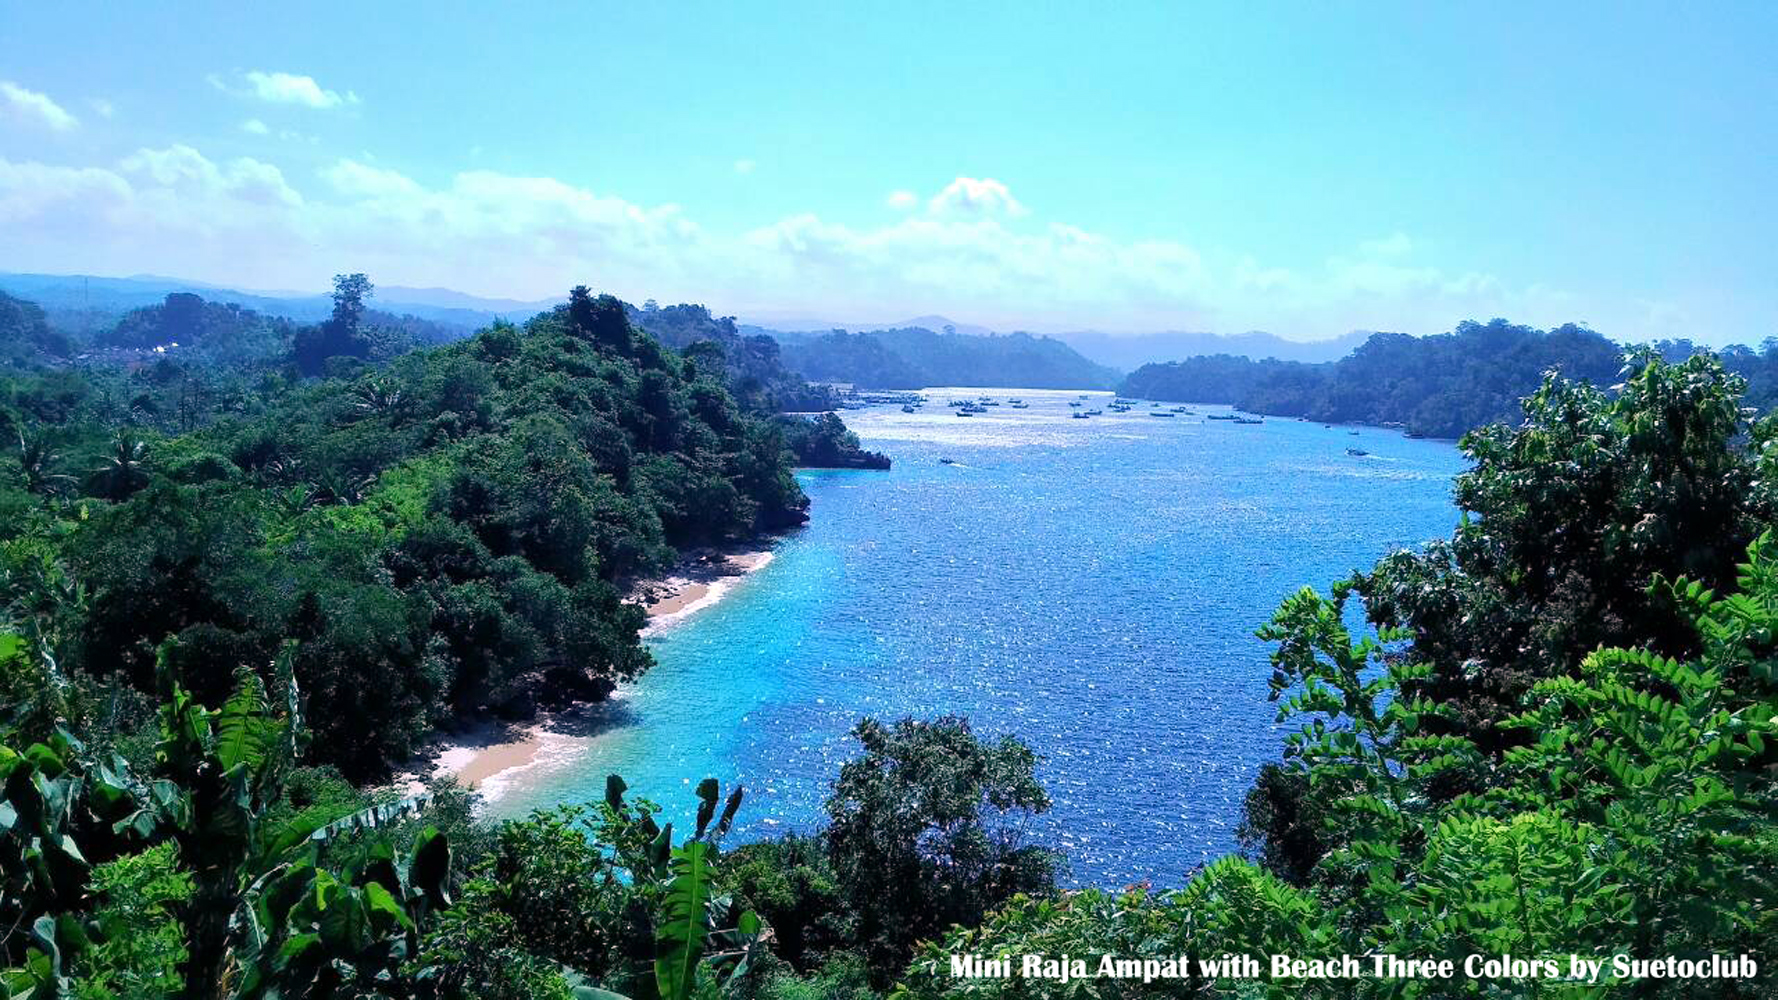 Perjalanan Pantai Mini Raja Ampat Gatra Tiga Warna Malang 1431835453422